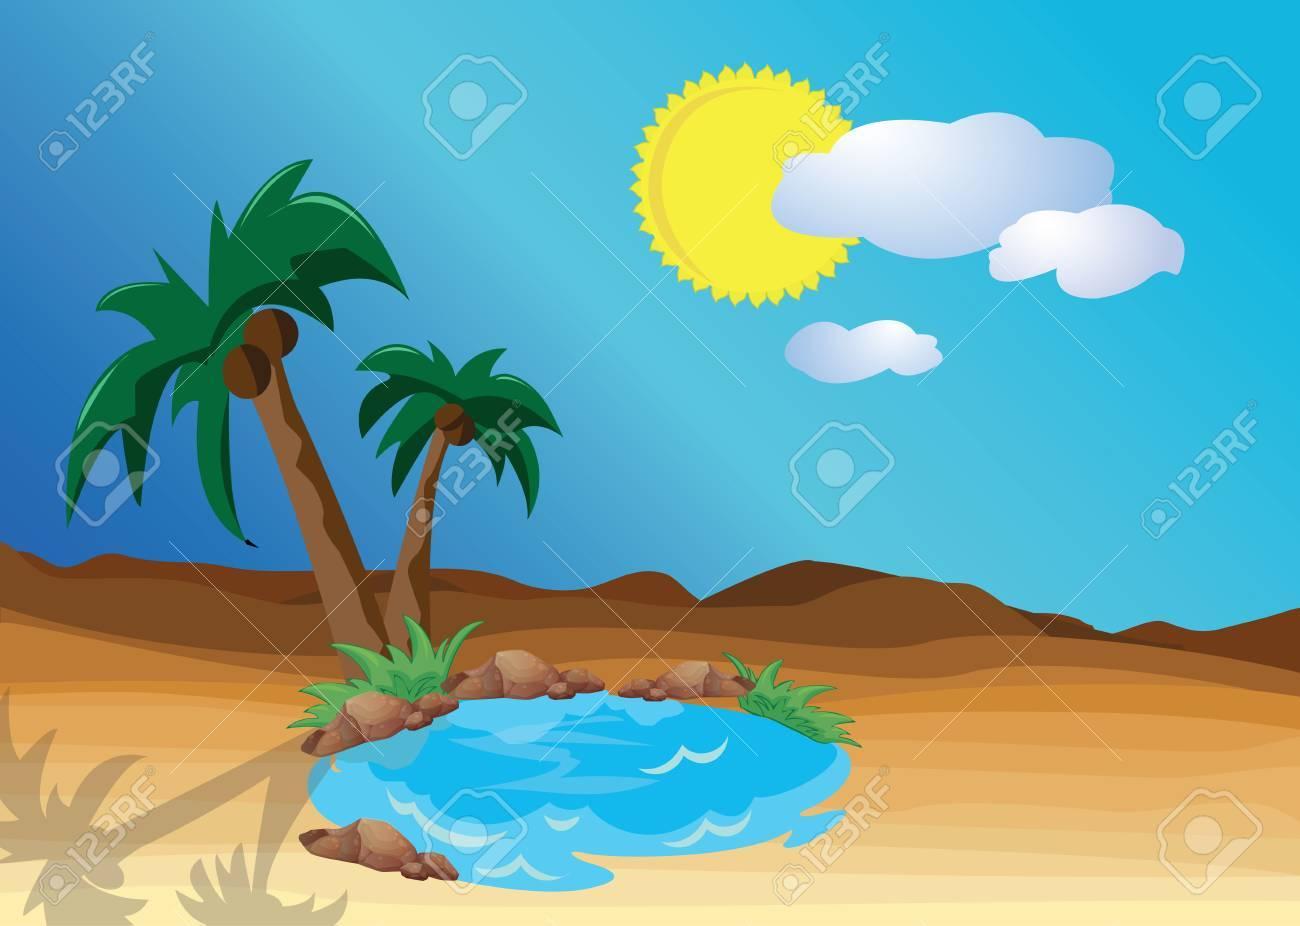 Desert oasis clipart 9 » Clipart Portal.